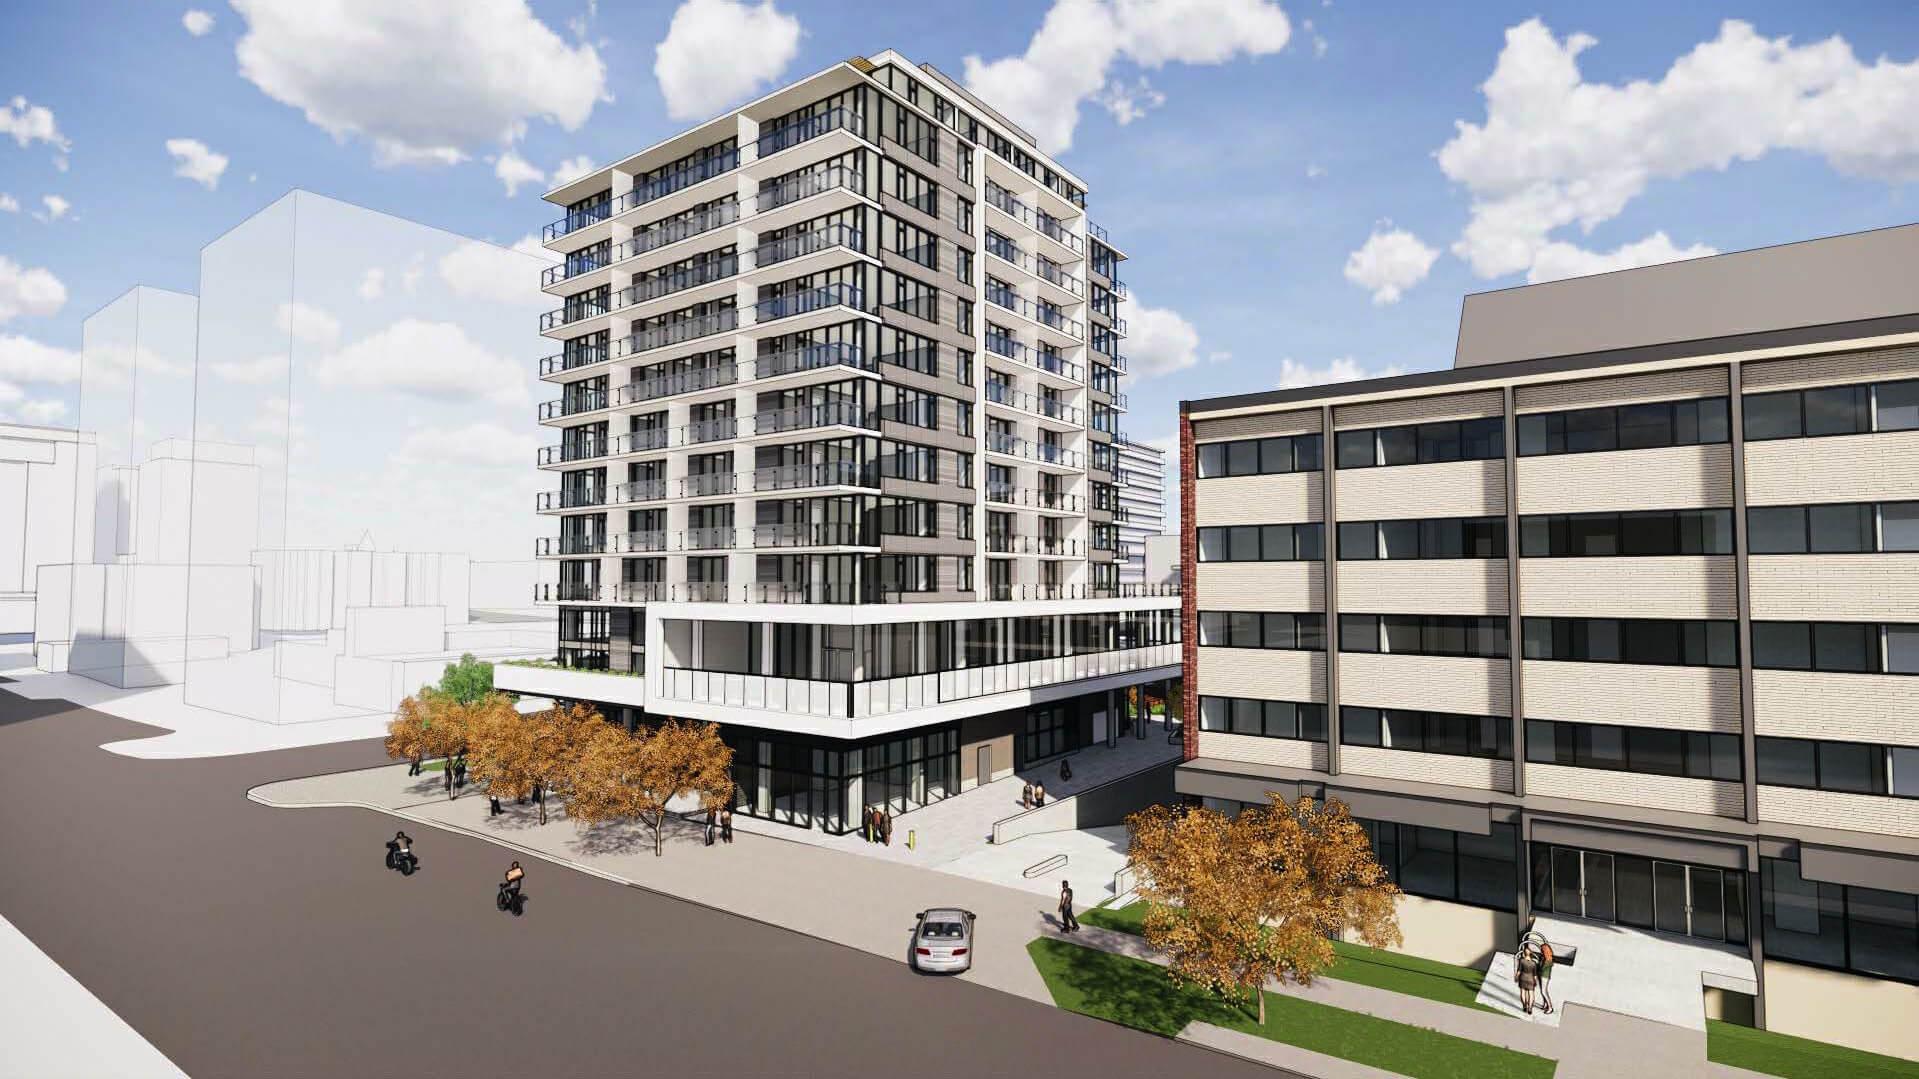 Photo Of New Development In Victoria - Nest